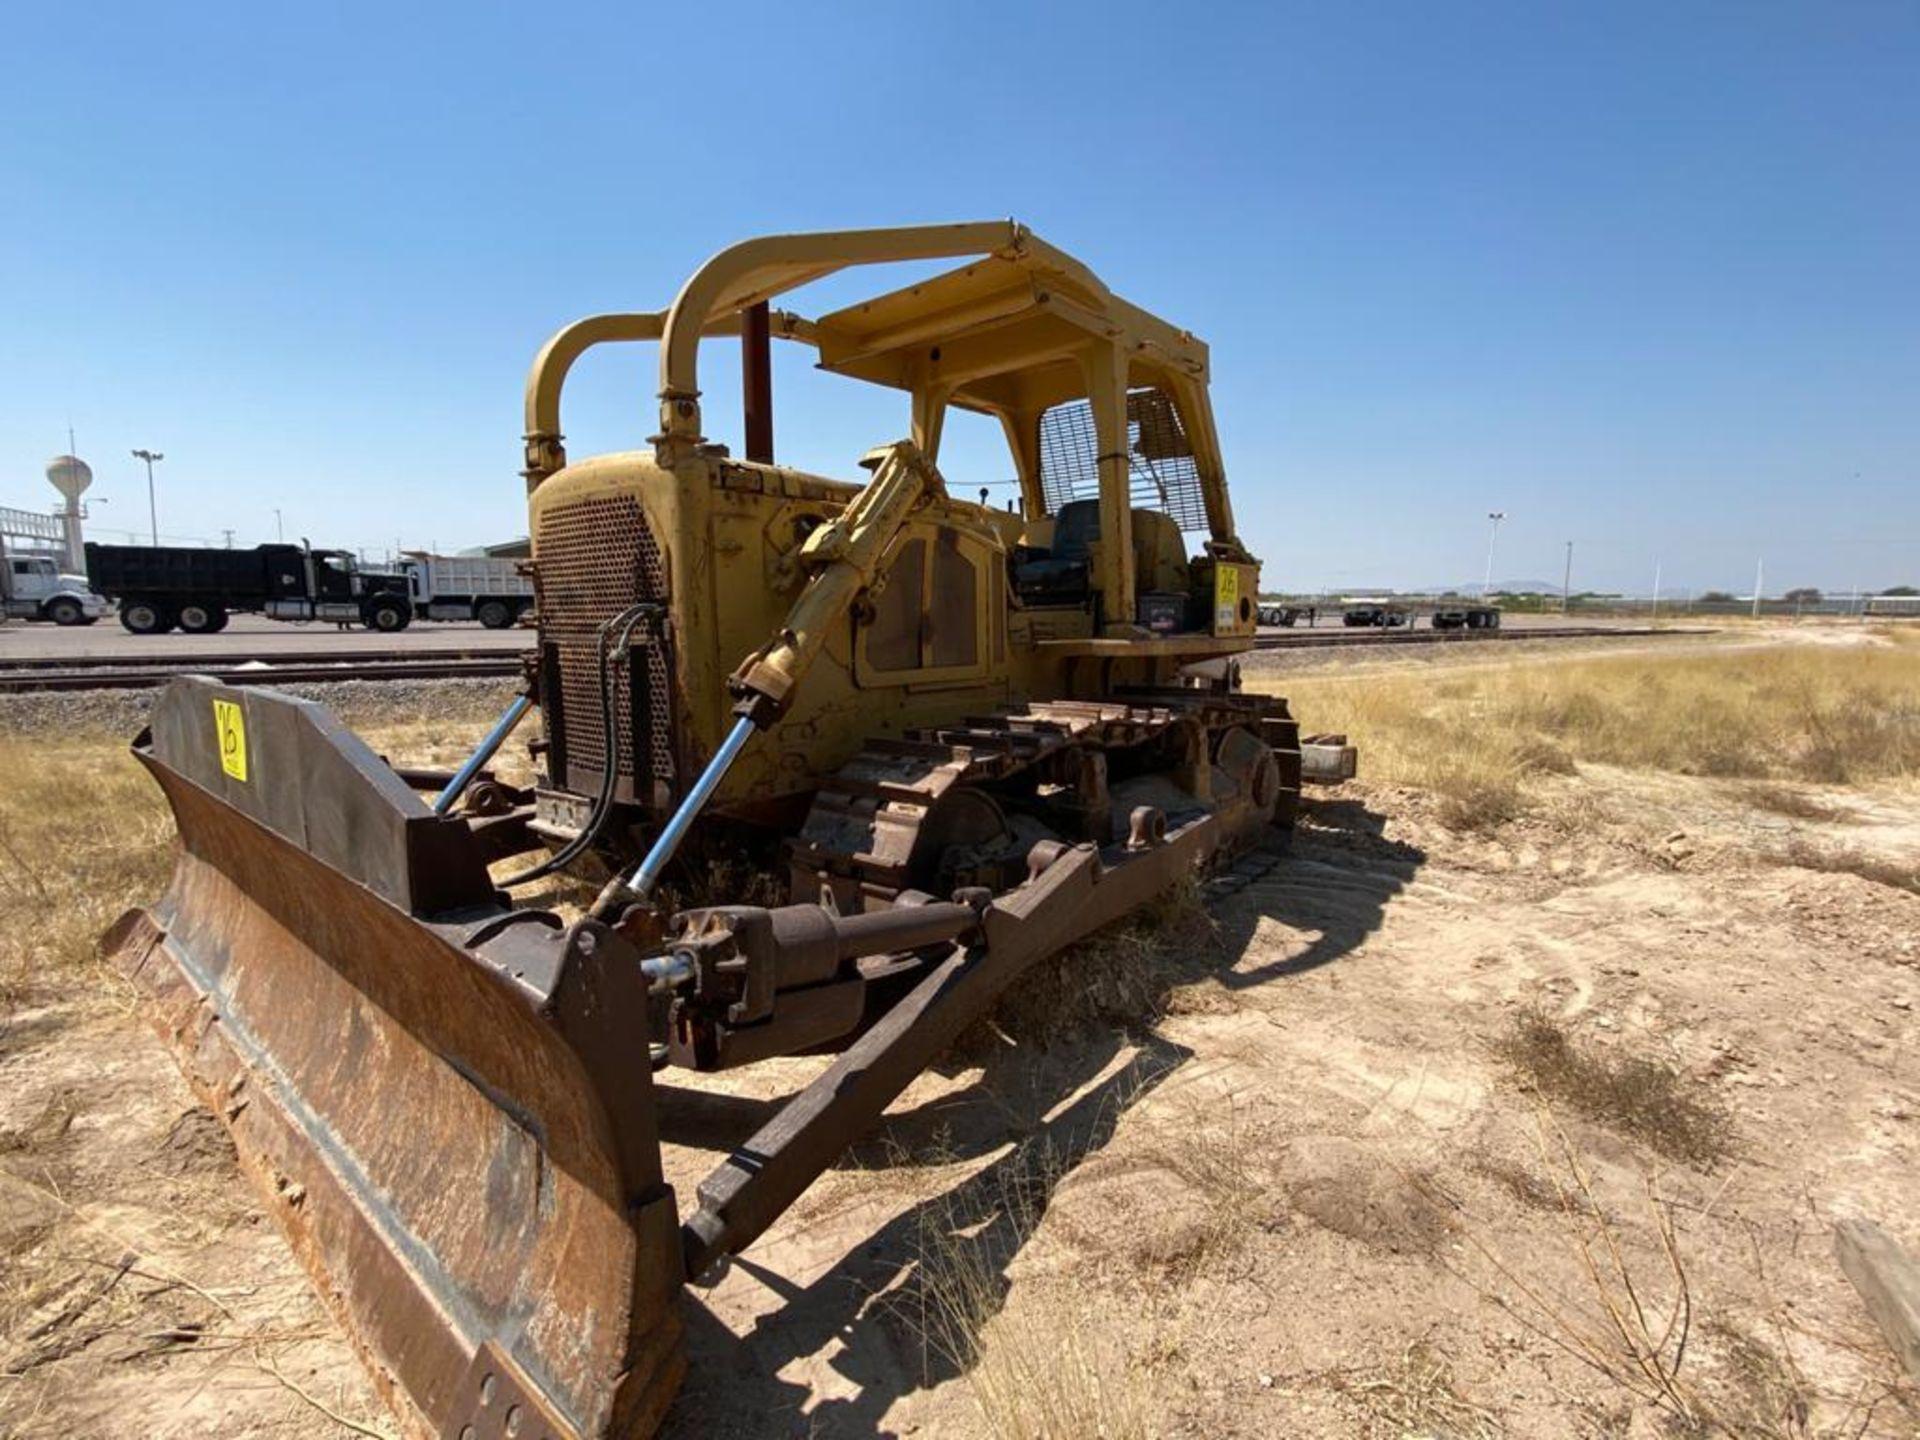 Caterpillar D7G Bulldozer, Serial number 92V5897, Diesel motor - Image 6 of 48